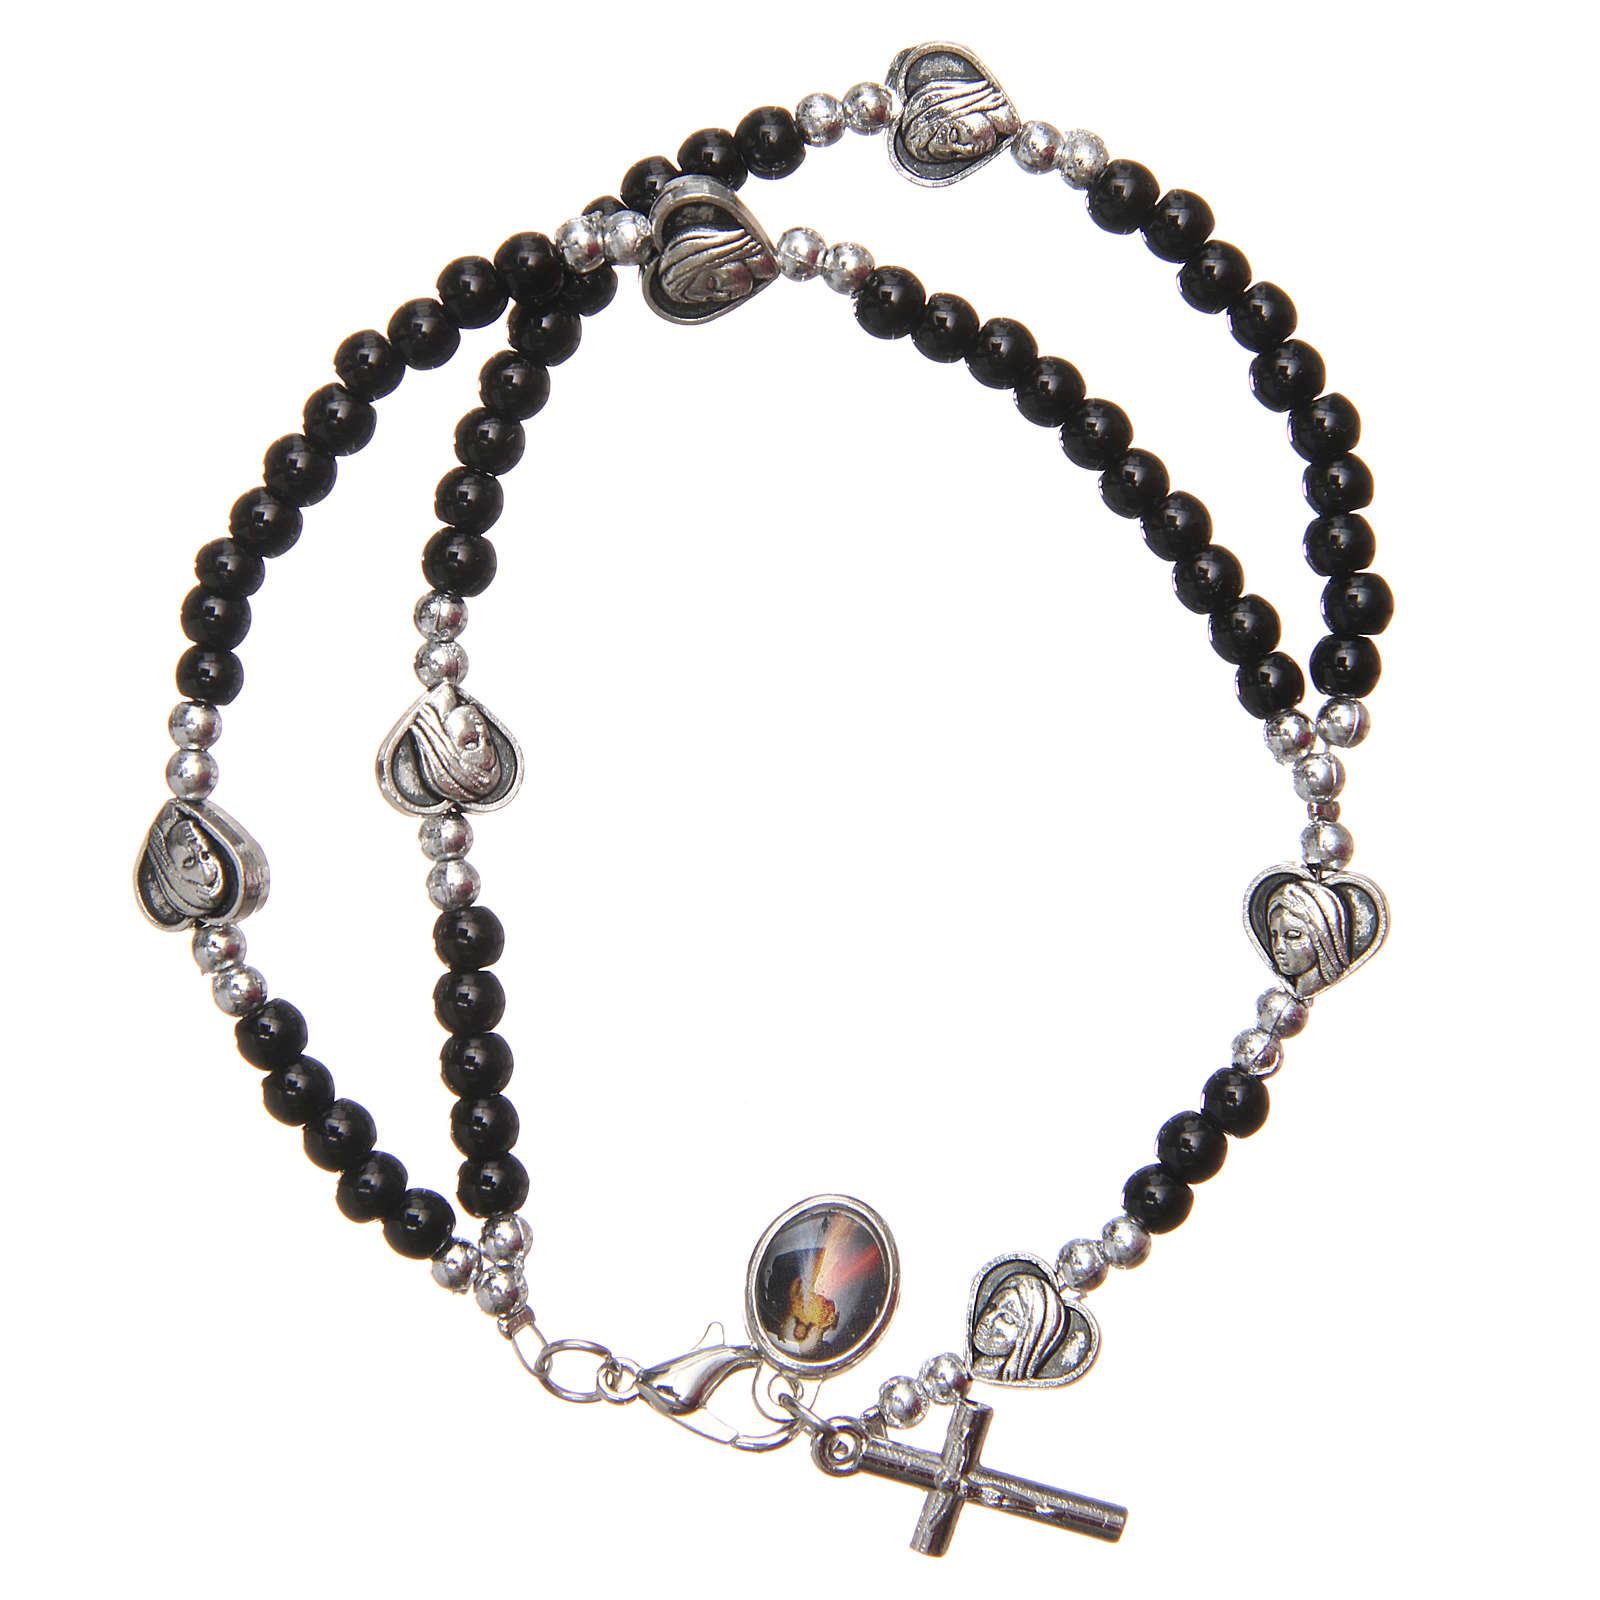 Bracelet black beads Our Lady of Medjugorje 4